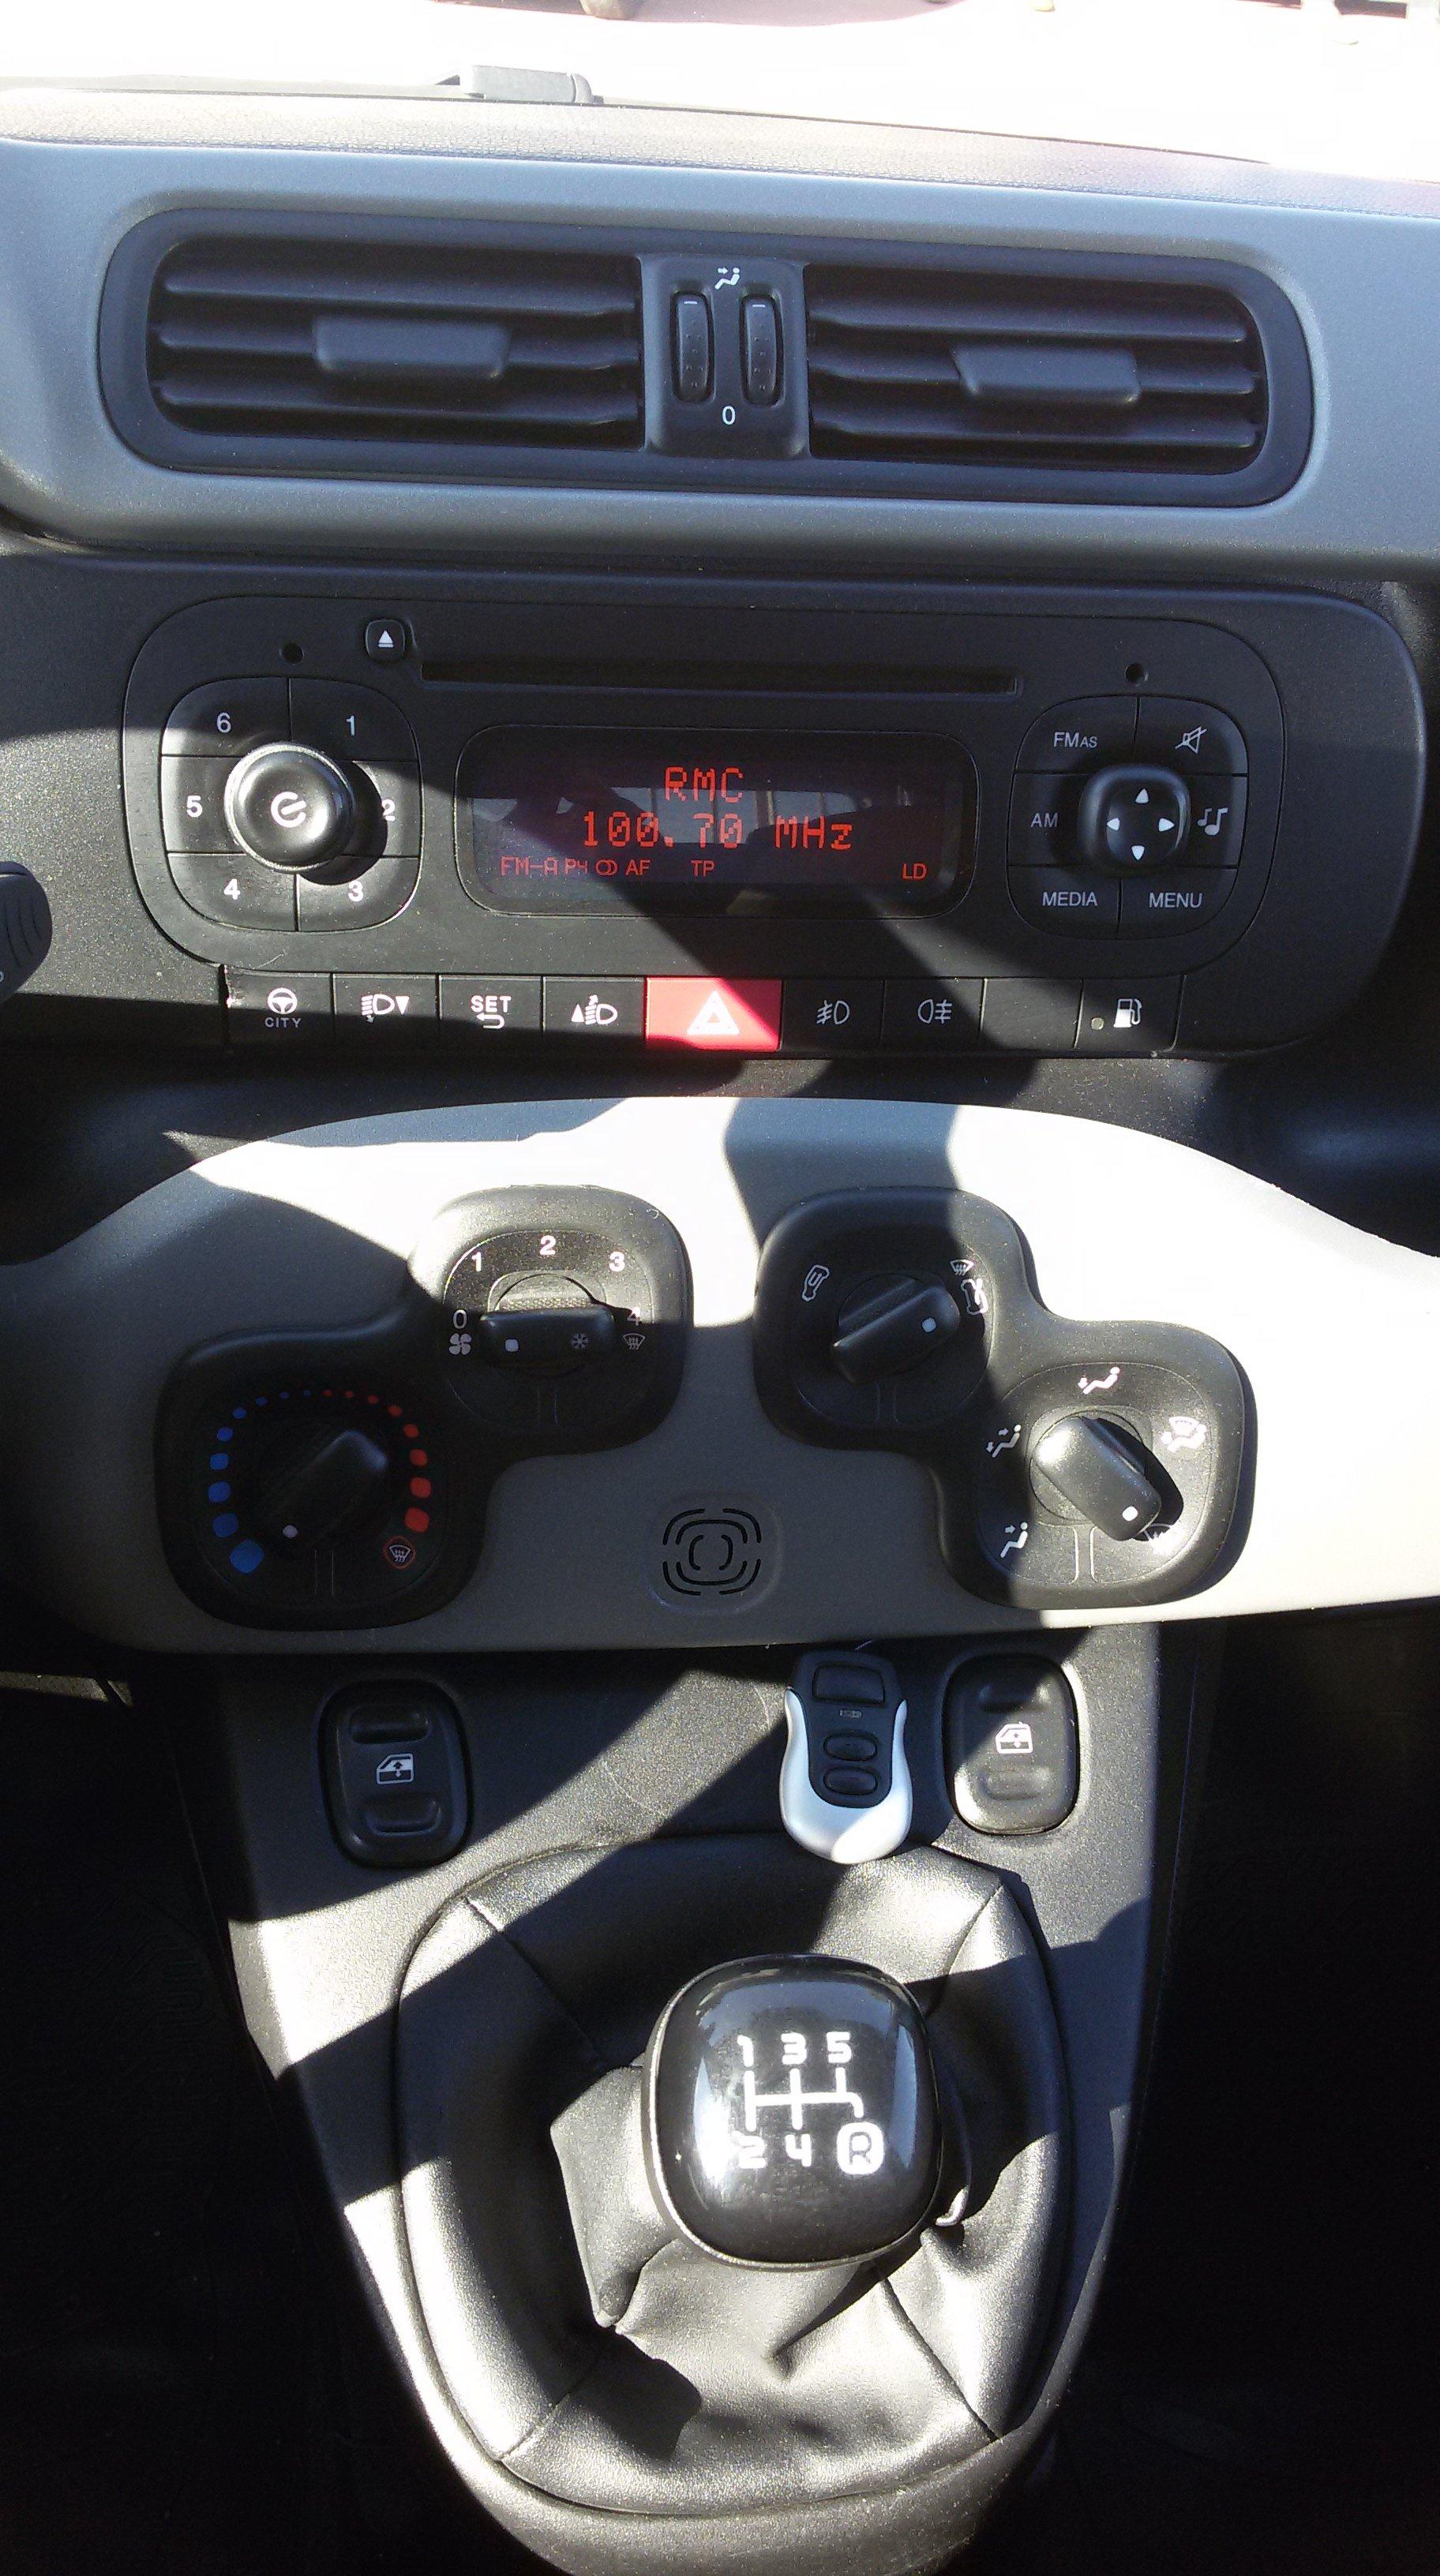 Fiat Panda TwinAir 0.9 Turbo Natural Power